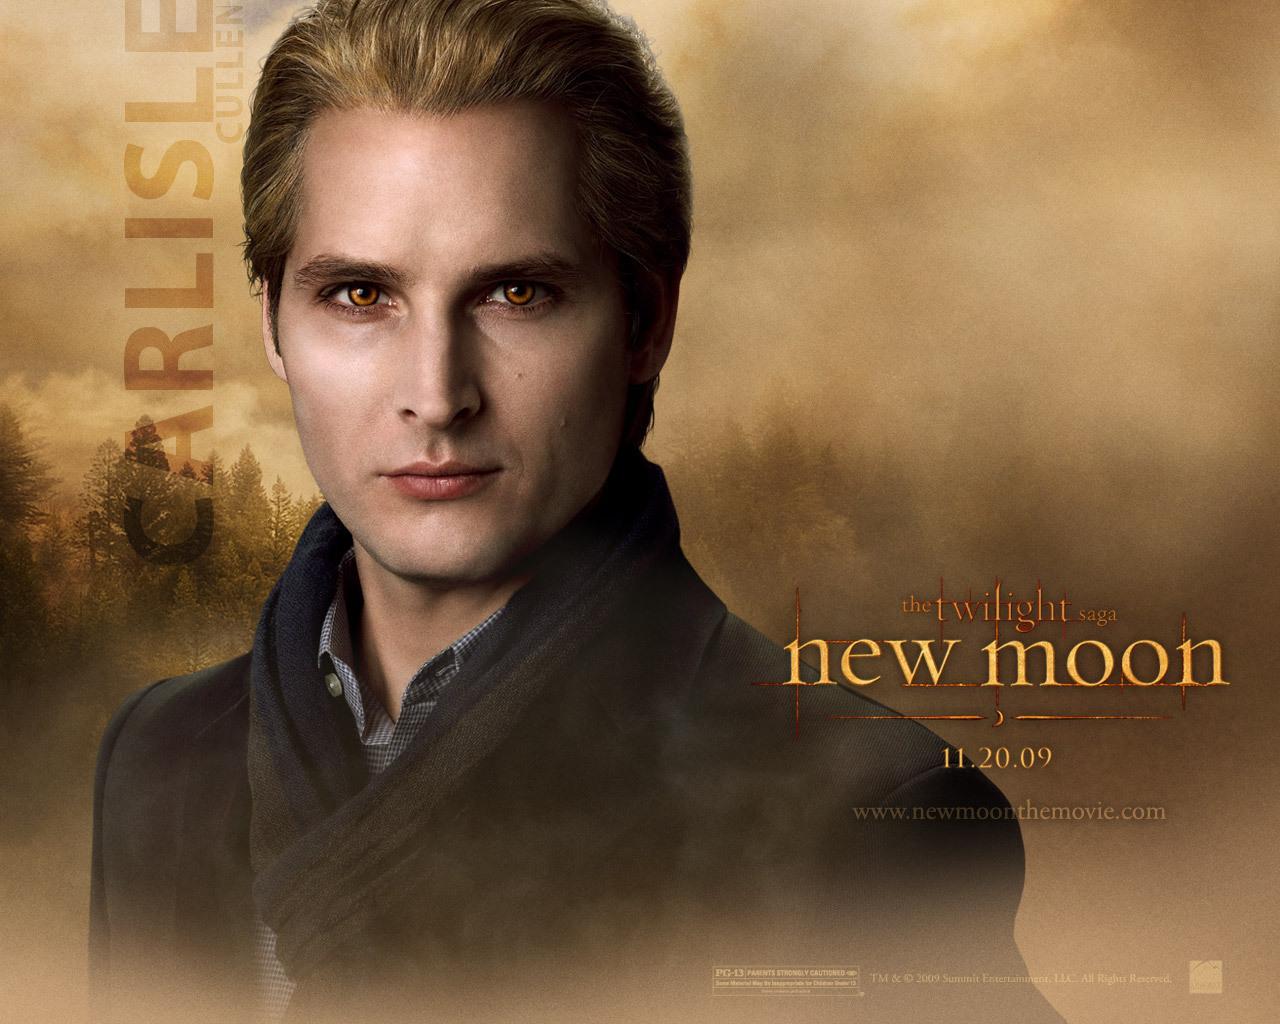 the twilight saga new moon movies maniac